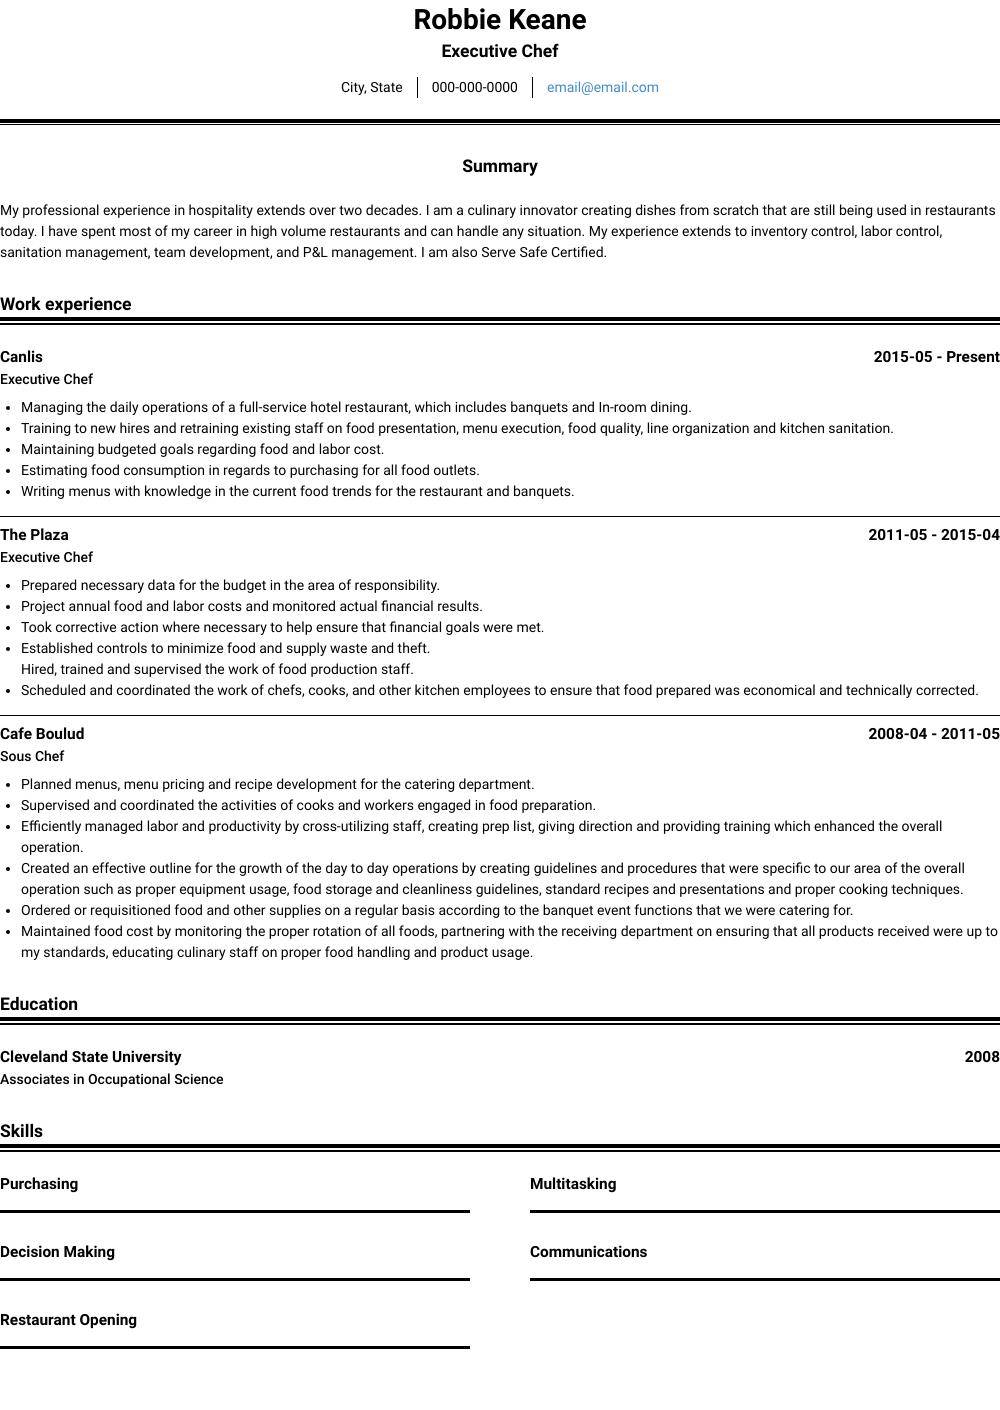 Chef Resume Samples & Templates VisualCV Chef resume